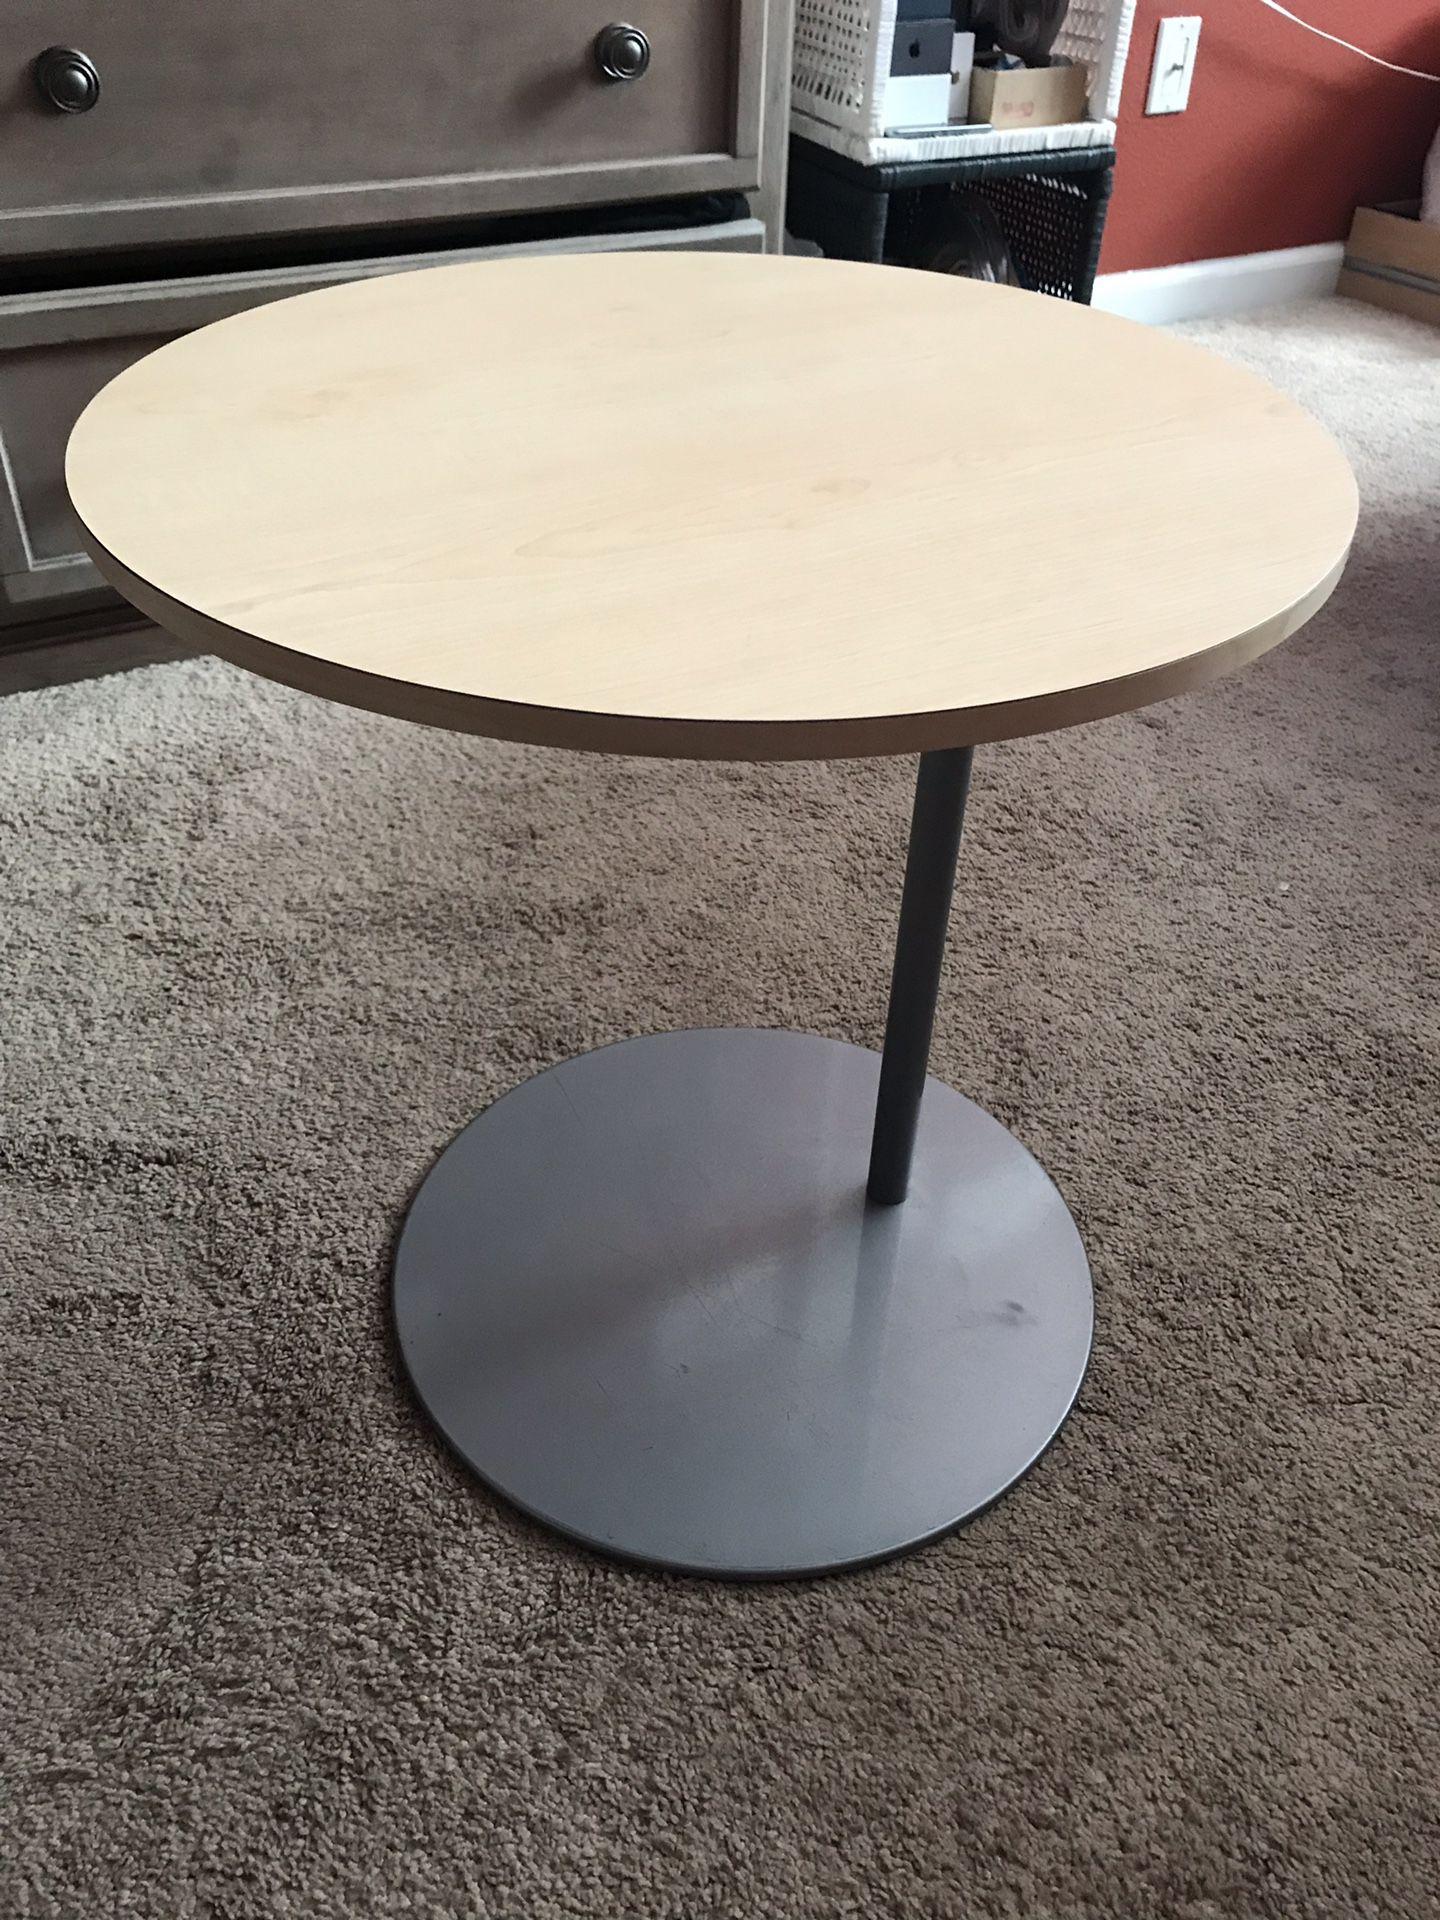 Round white wooden pedestal table